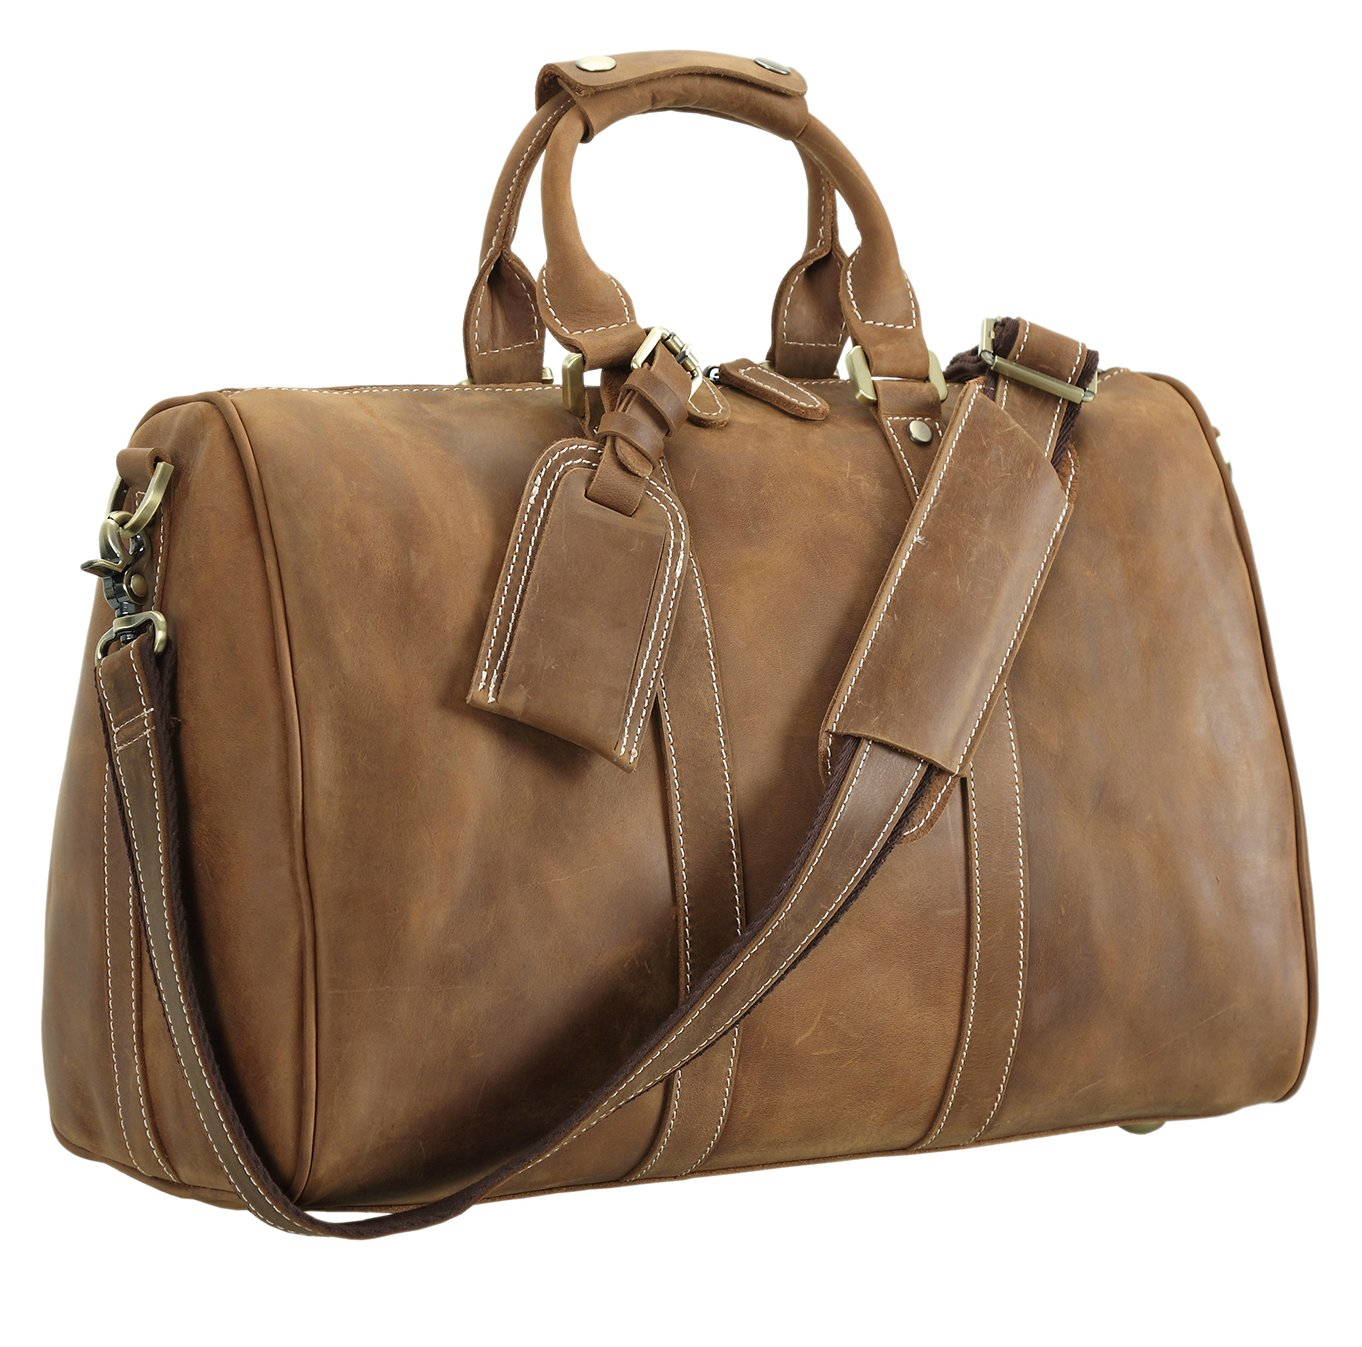 Polare Full Grain Leather Classic Duffel Bag Travel Gym Weekend Bag 17.3''